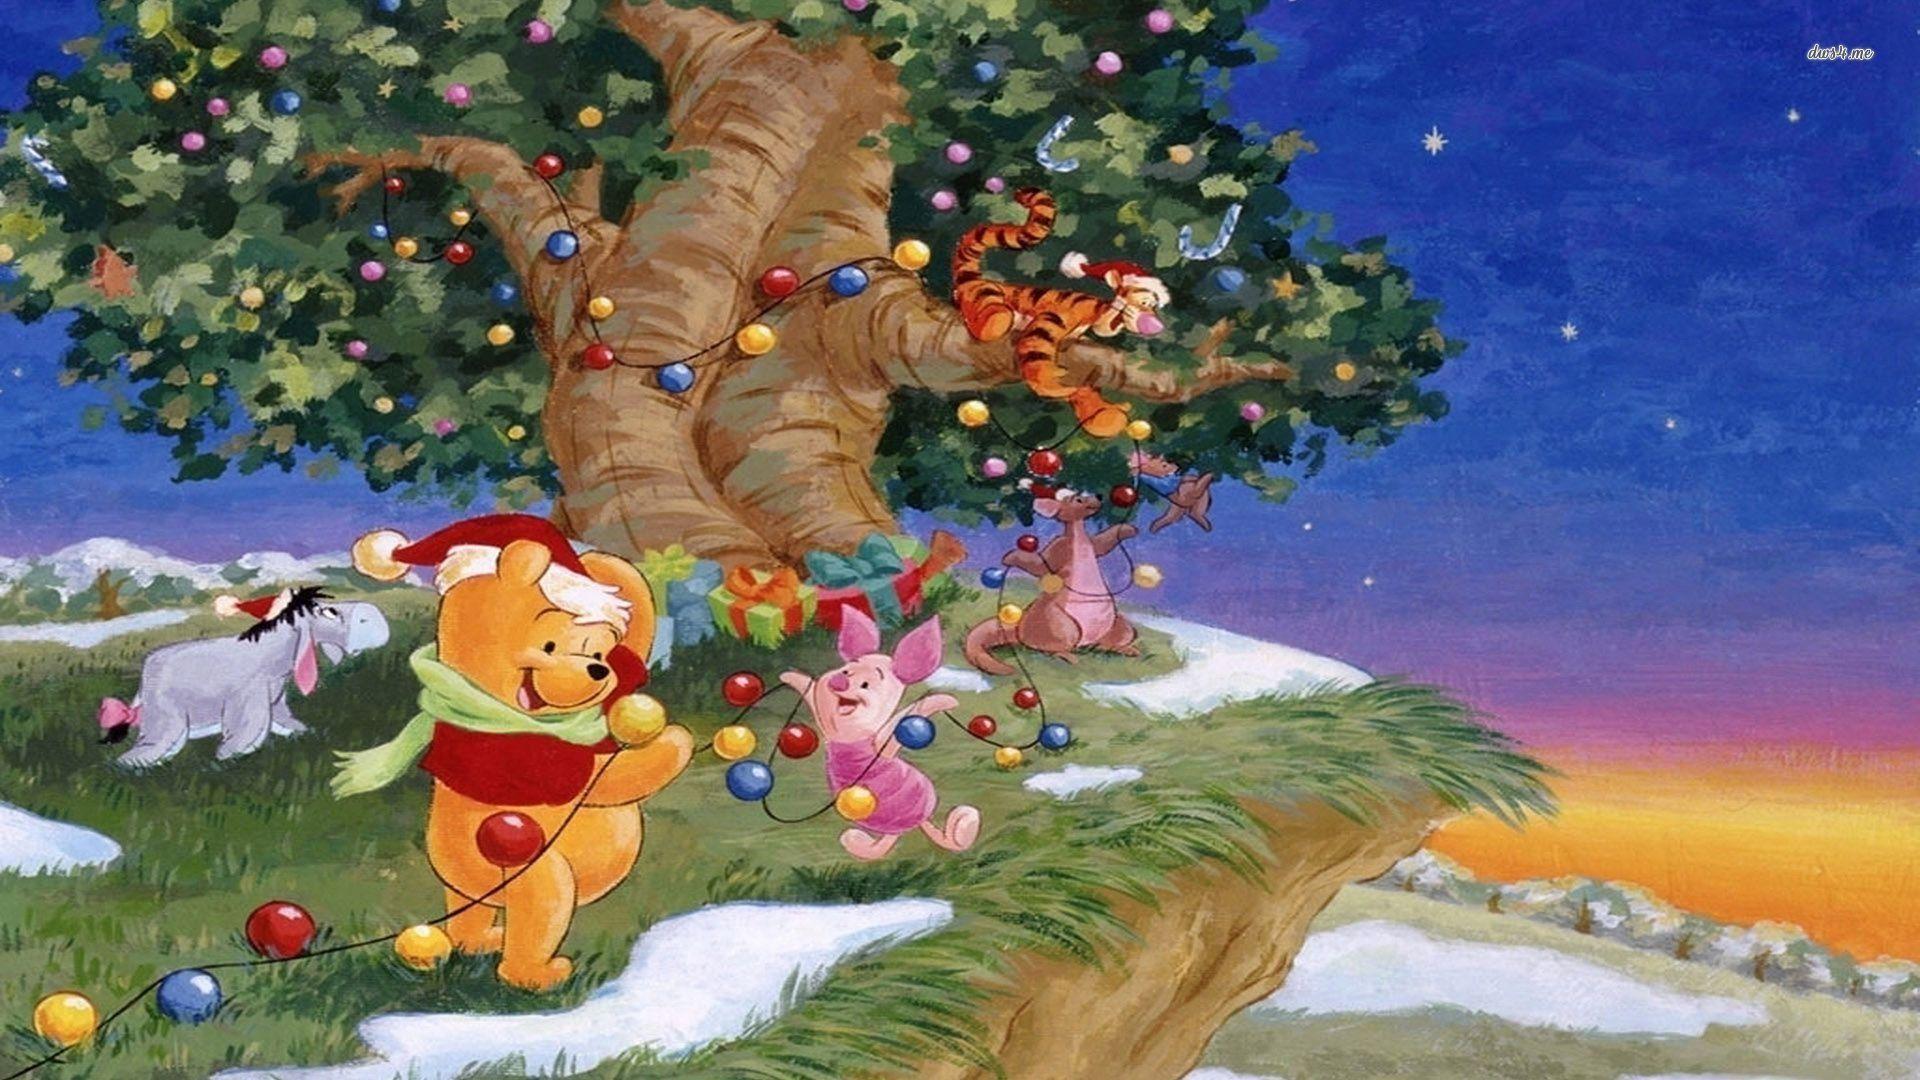 Cartoon Winnie The Pooh Pooh Wallpaper